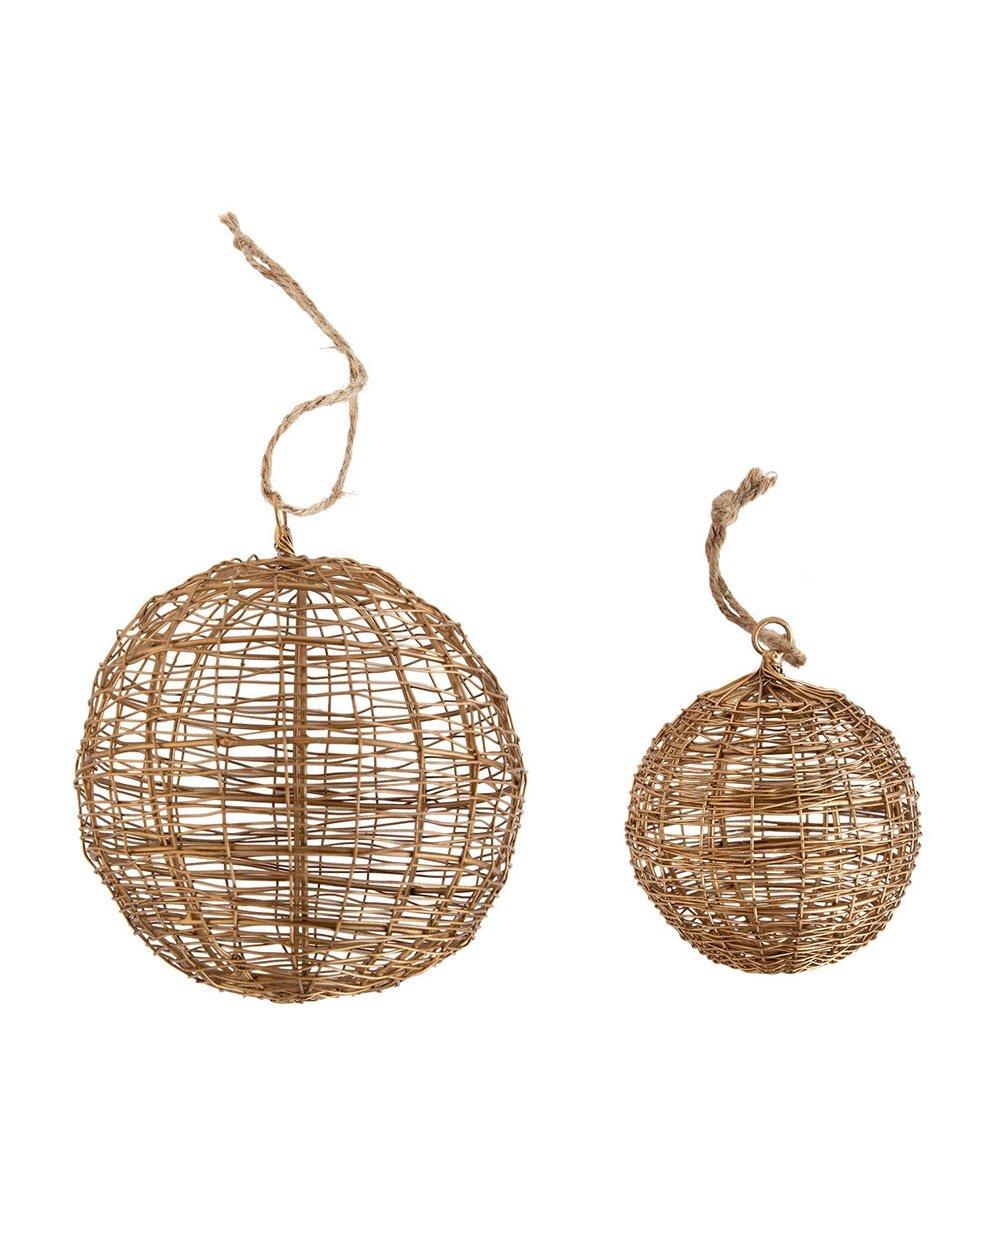 Wire_Ball_Ornaments_1.jpg